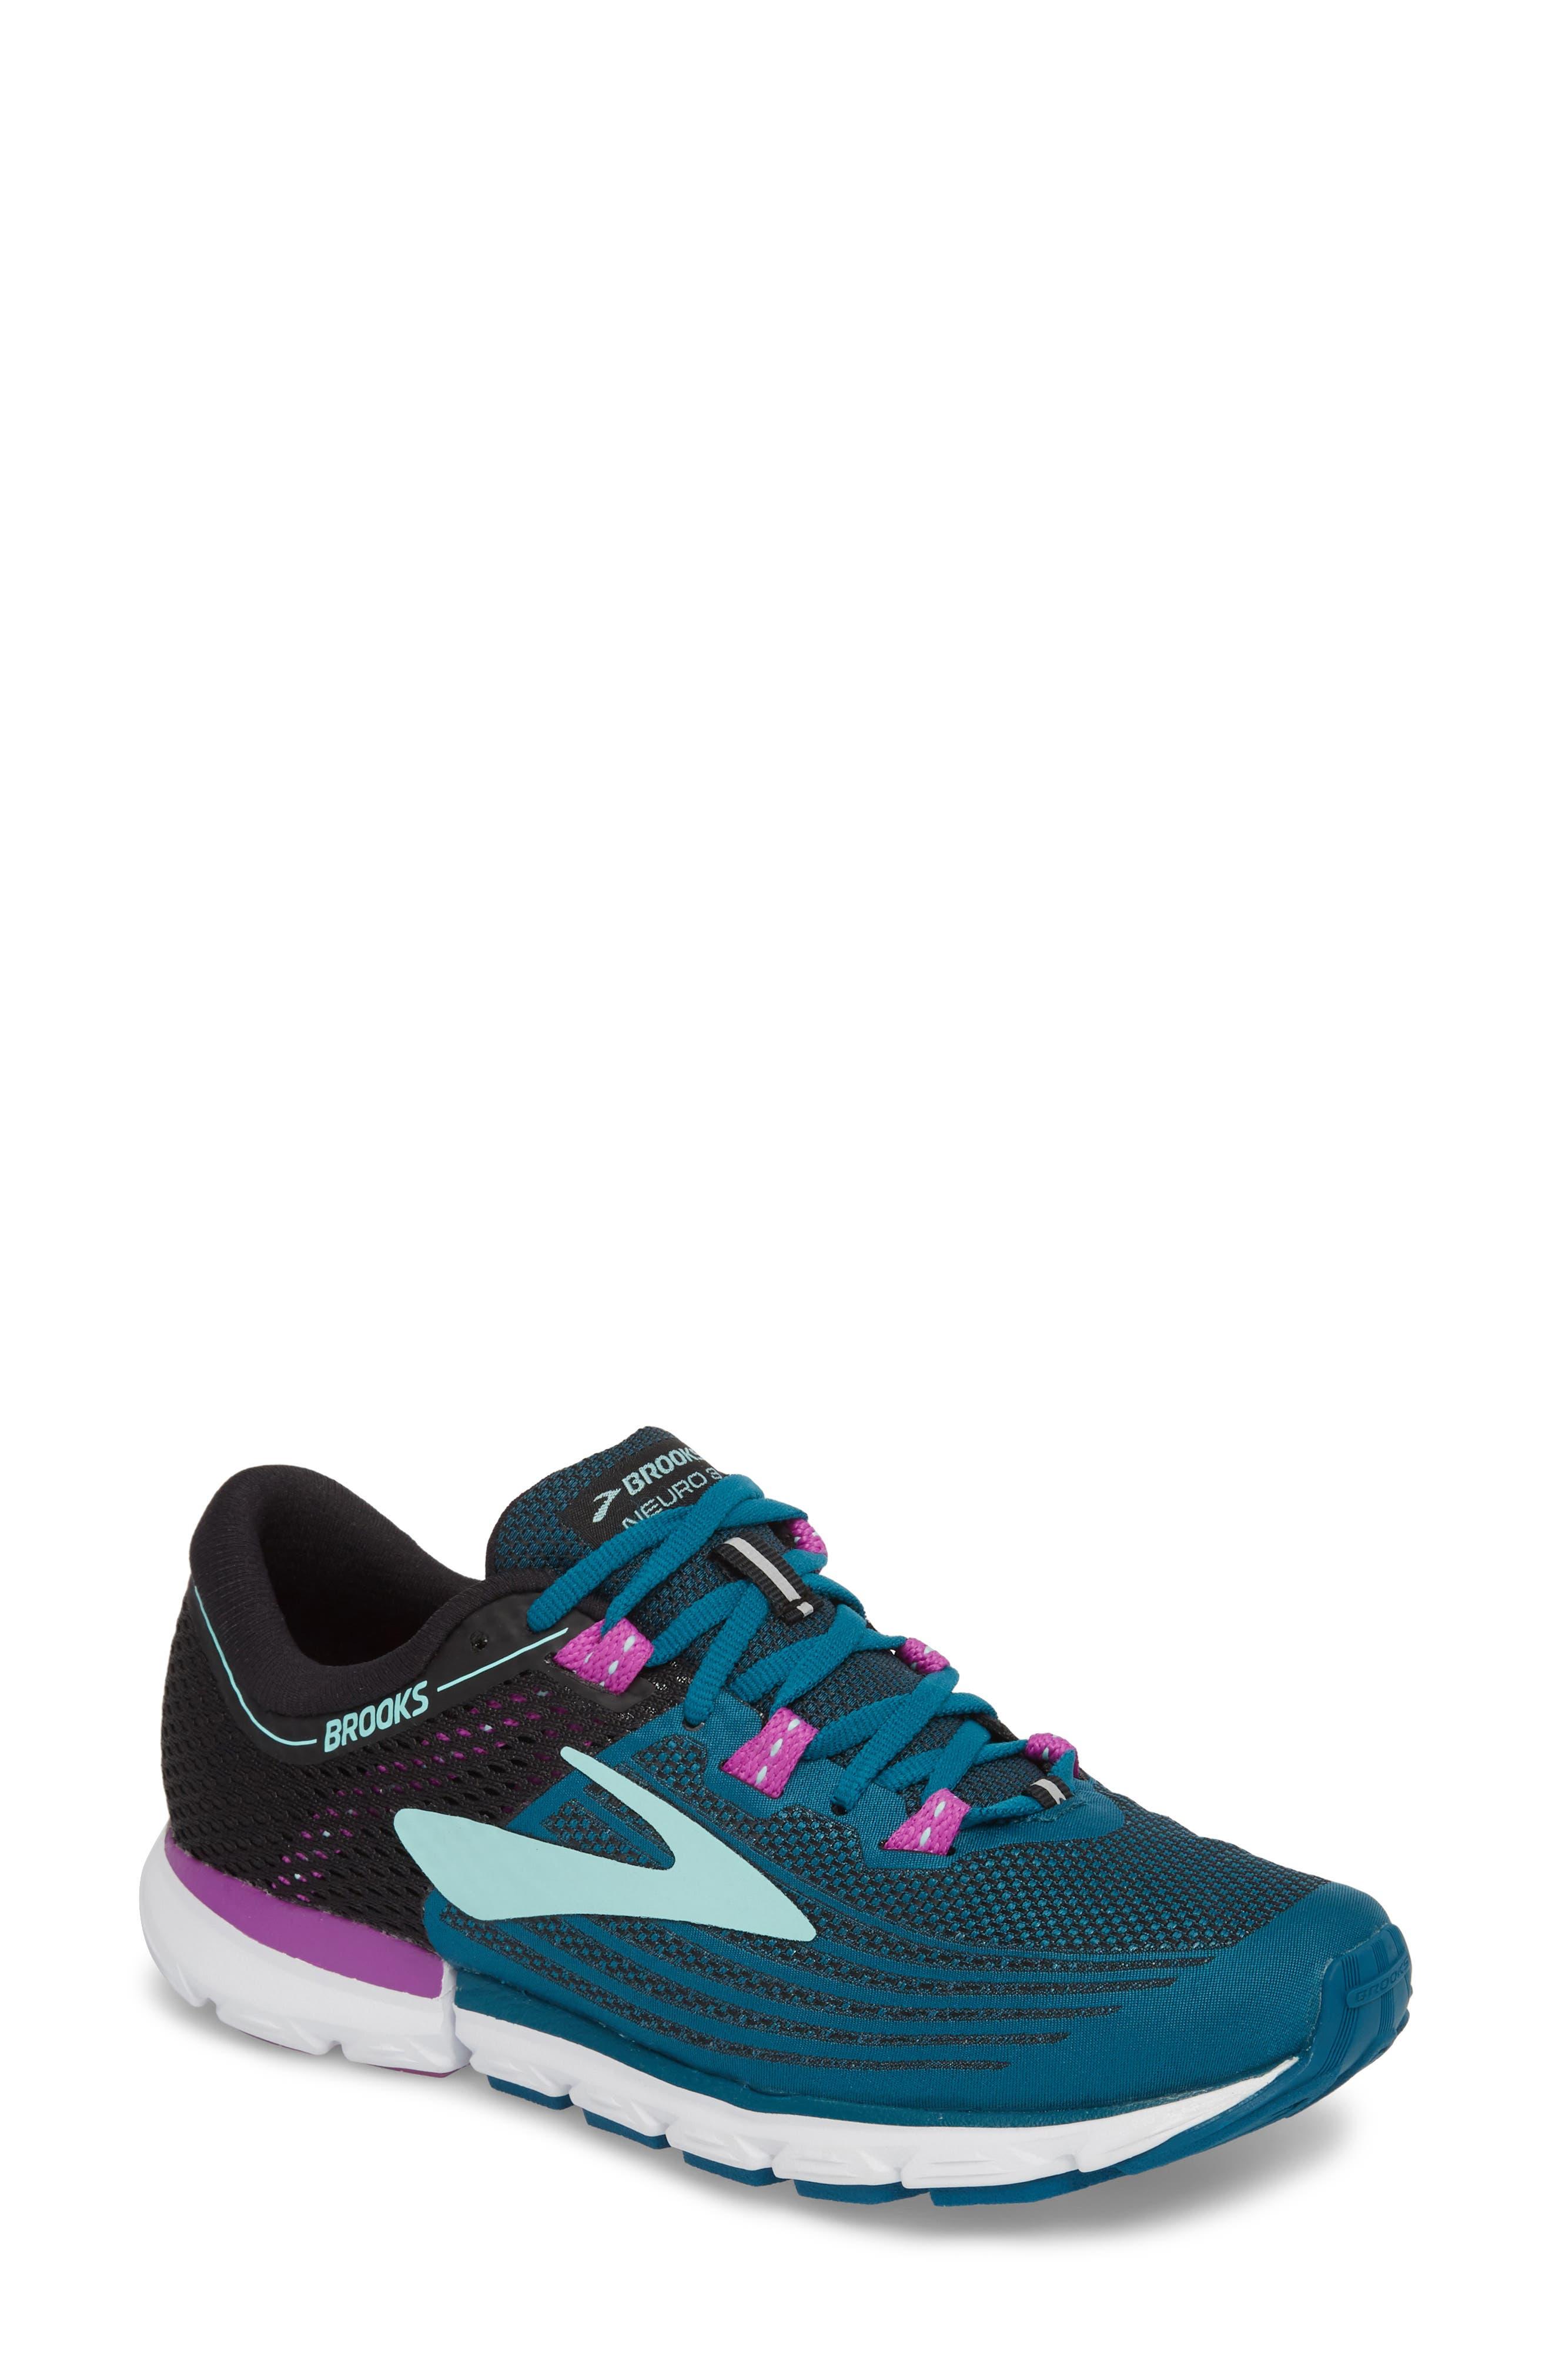 Neuro 3 Running Shoe,                             Main thumbnail 1, color,                             Lagoon/ Black/ Purple